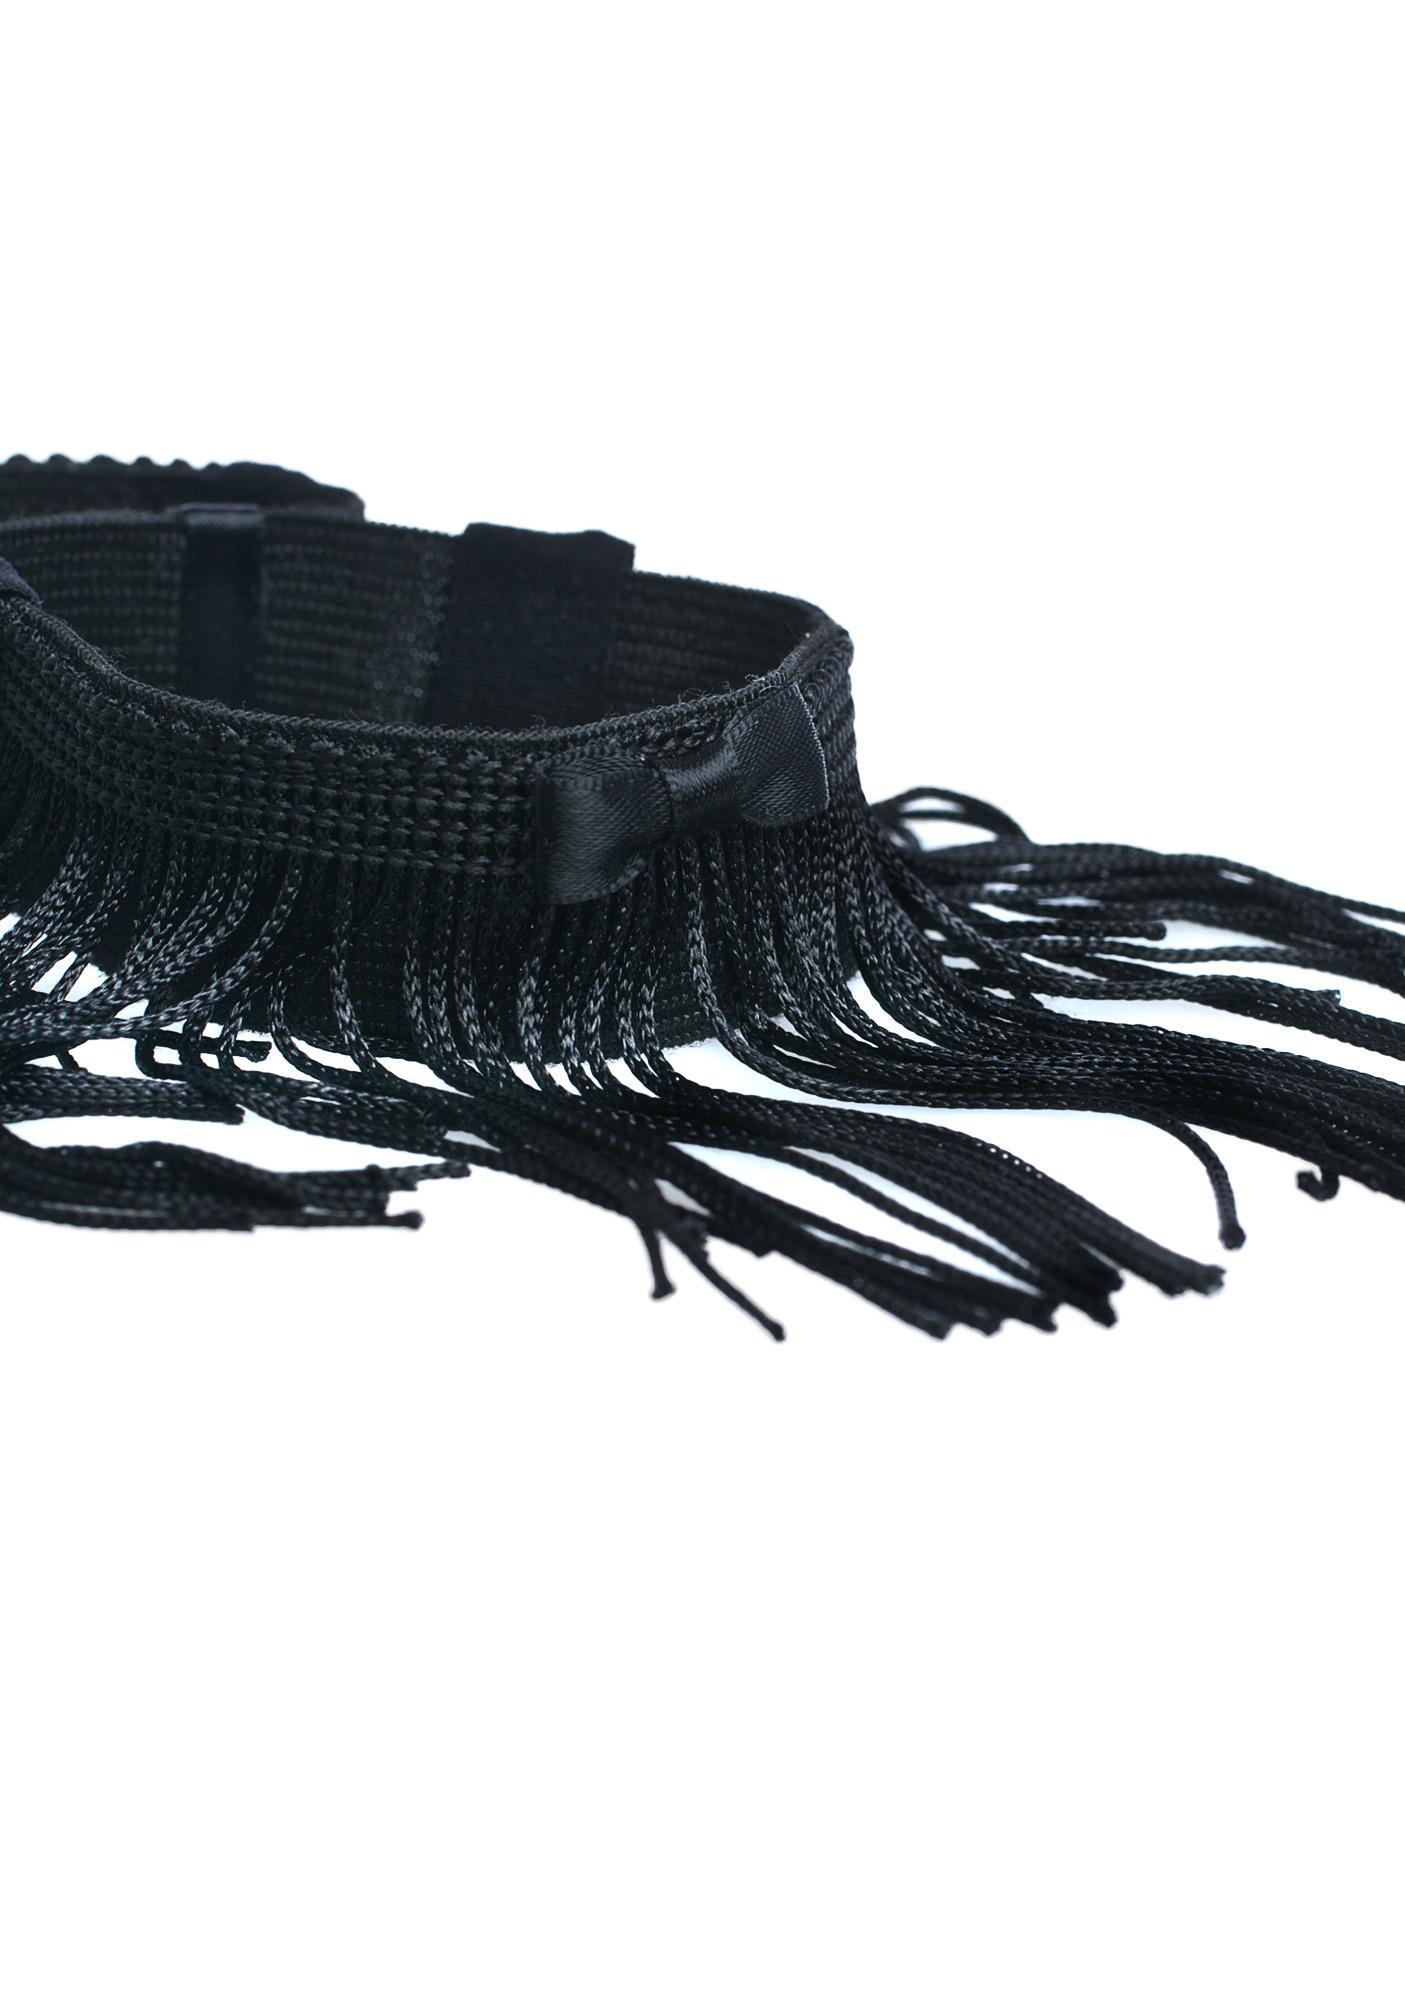 On Da Fringe Bracelet Cuffs